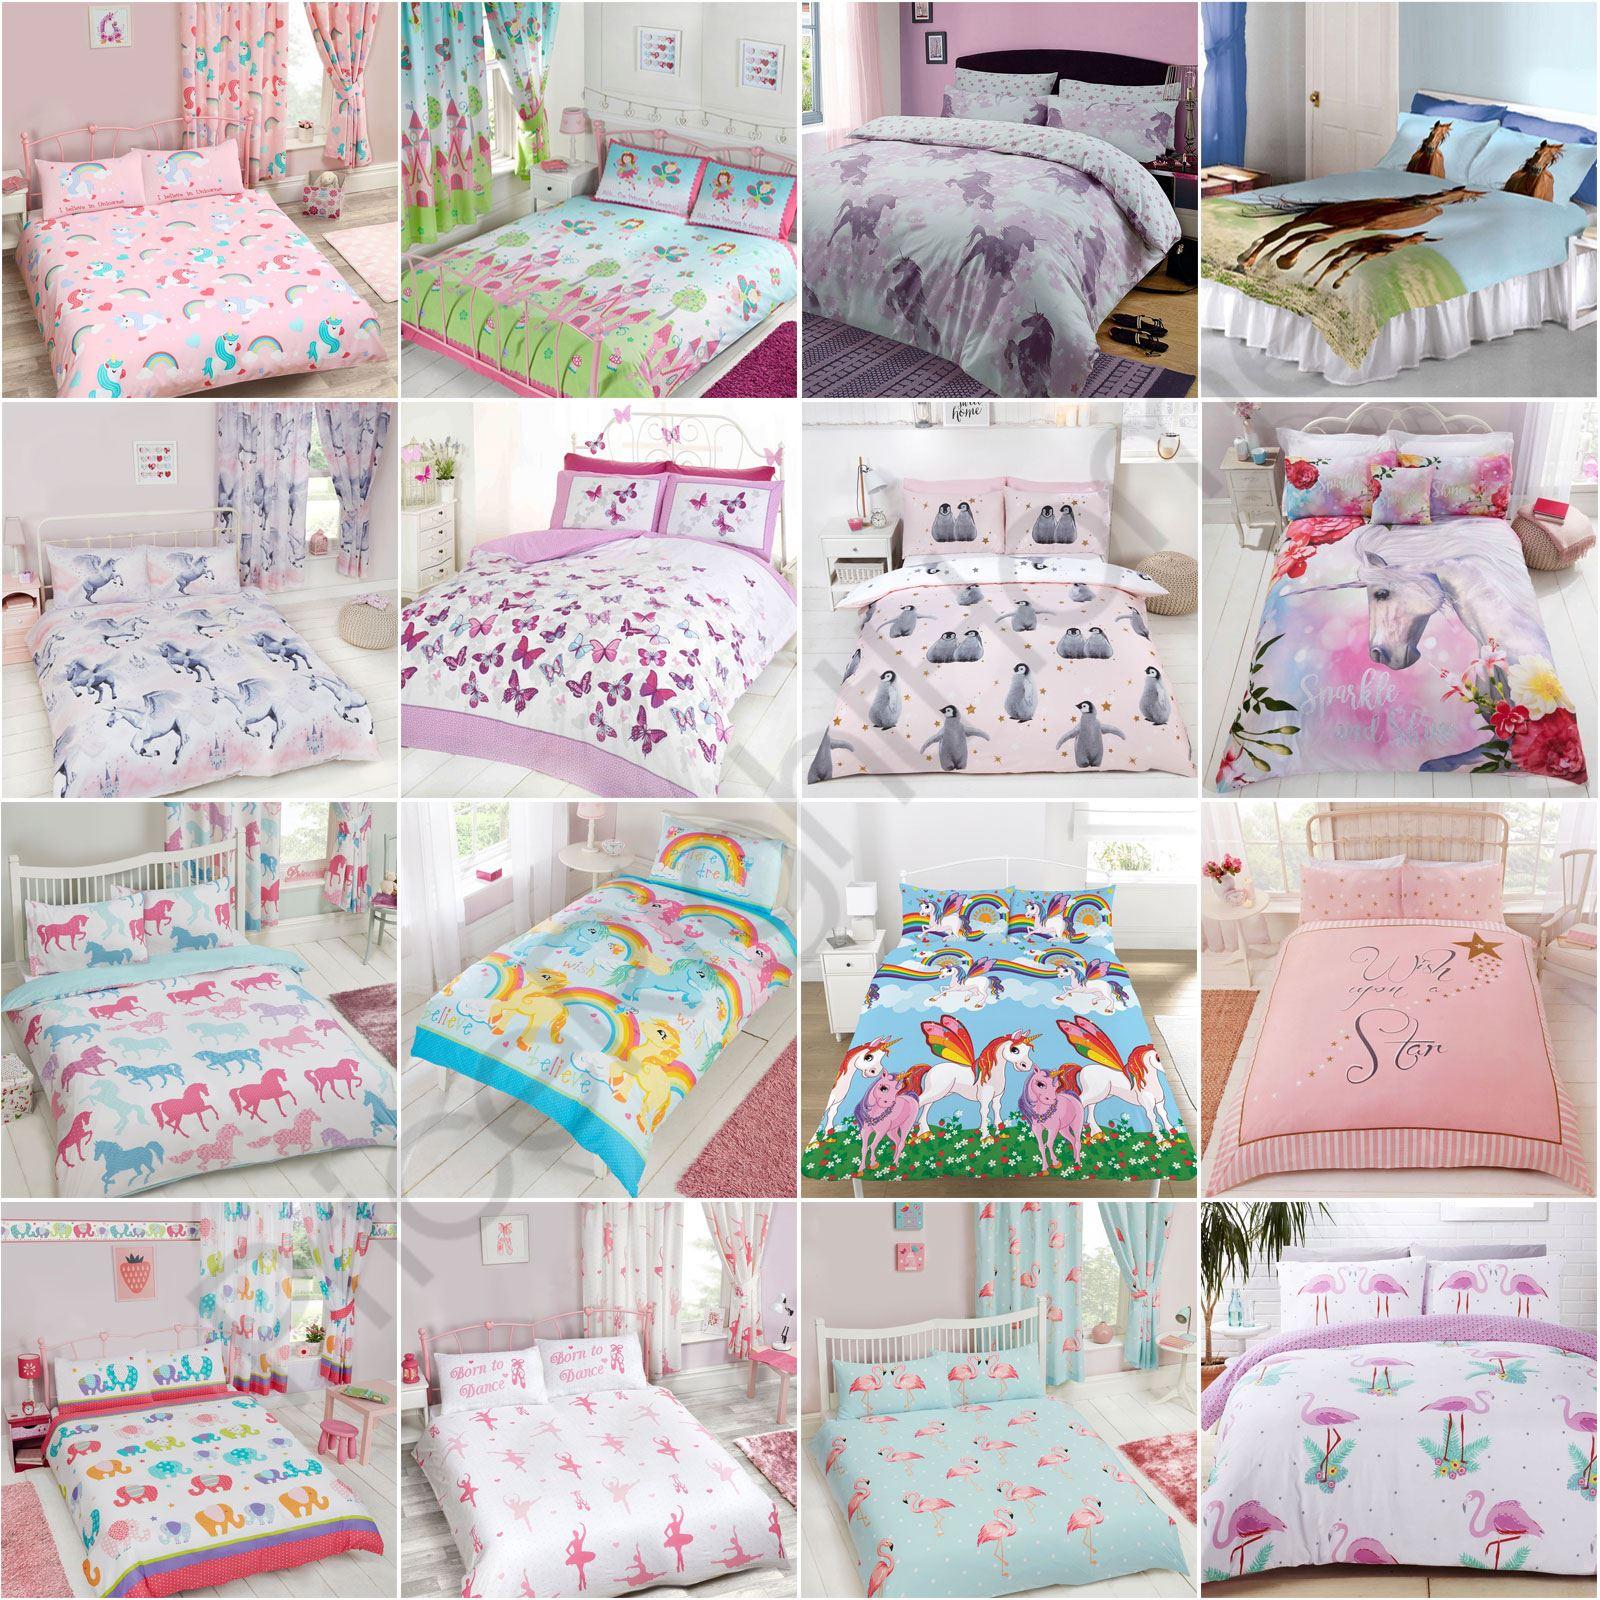 Girls Double Duvet Cover Sets  Unicorns, Butterflies, Owls, Pug,